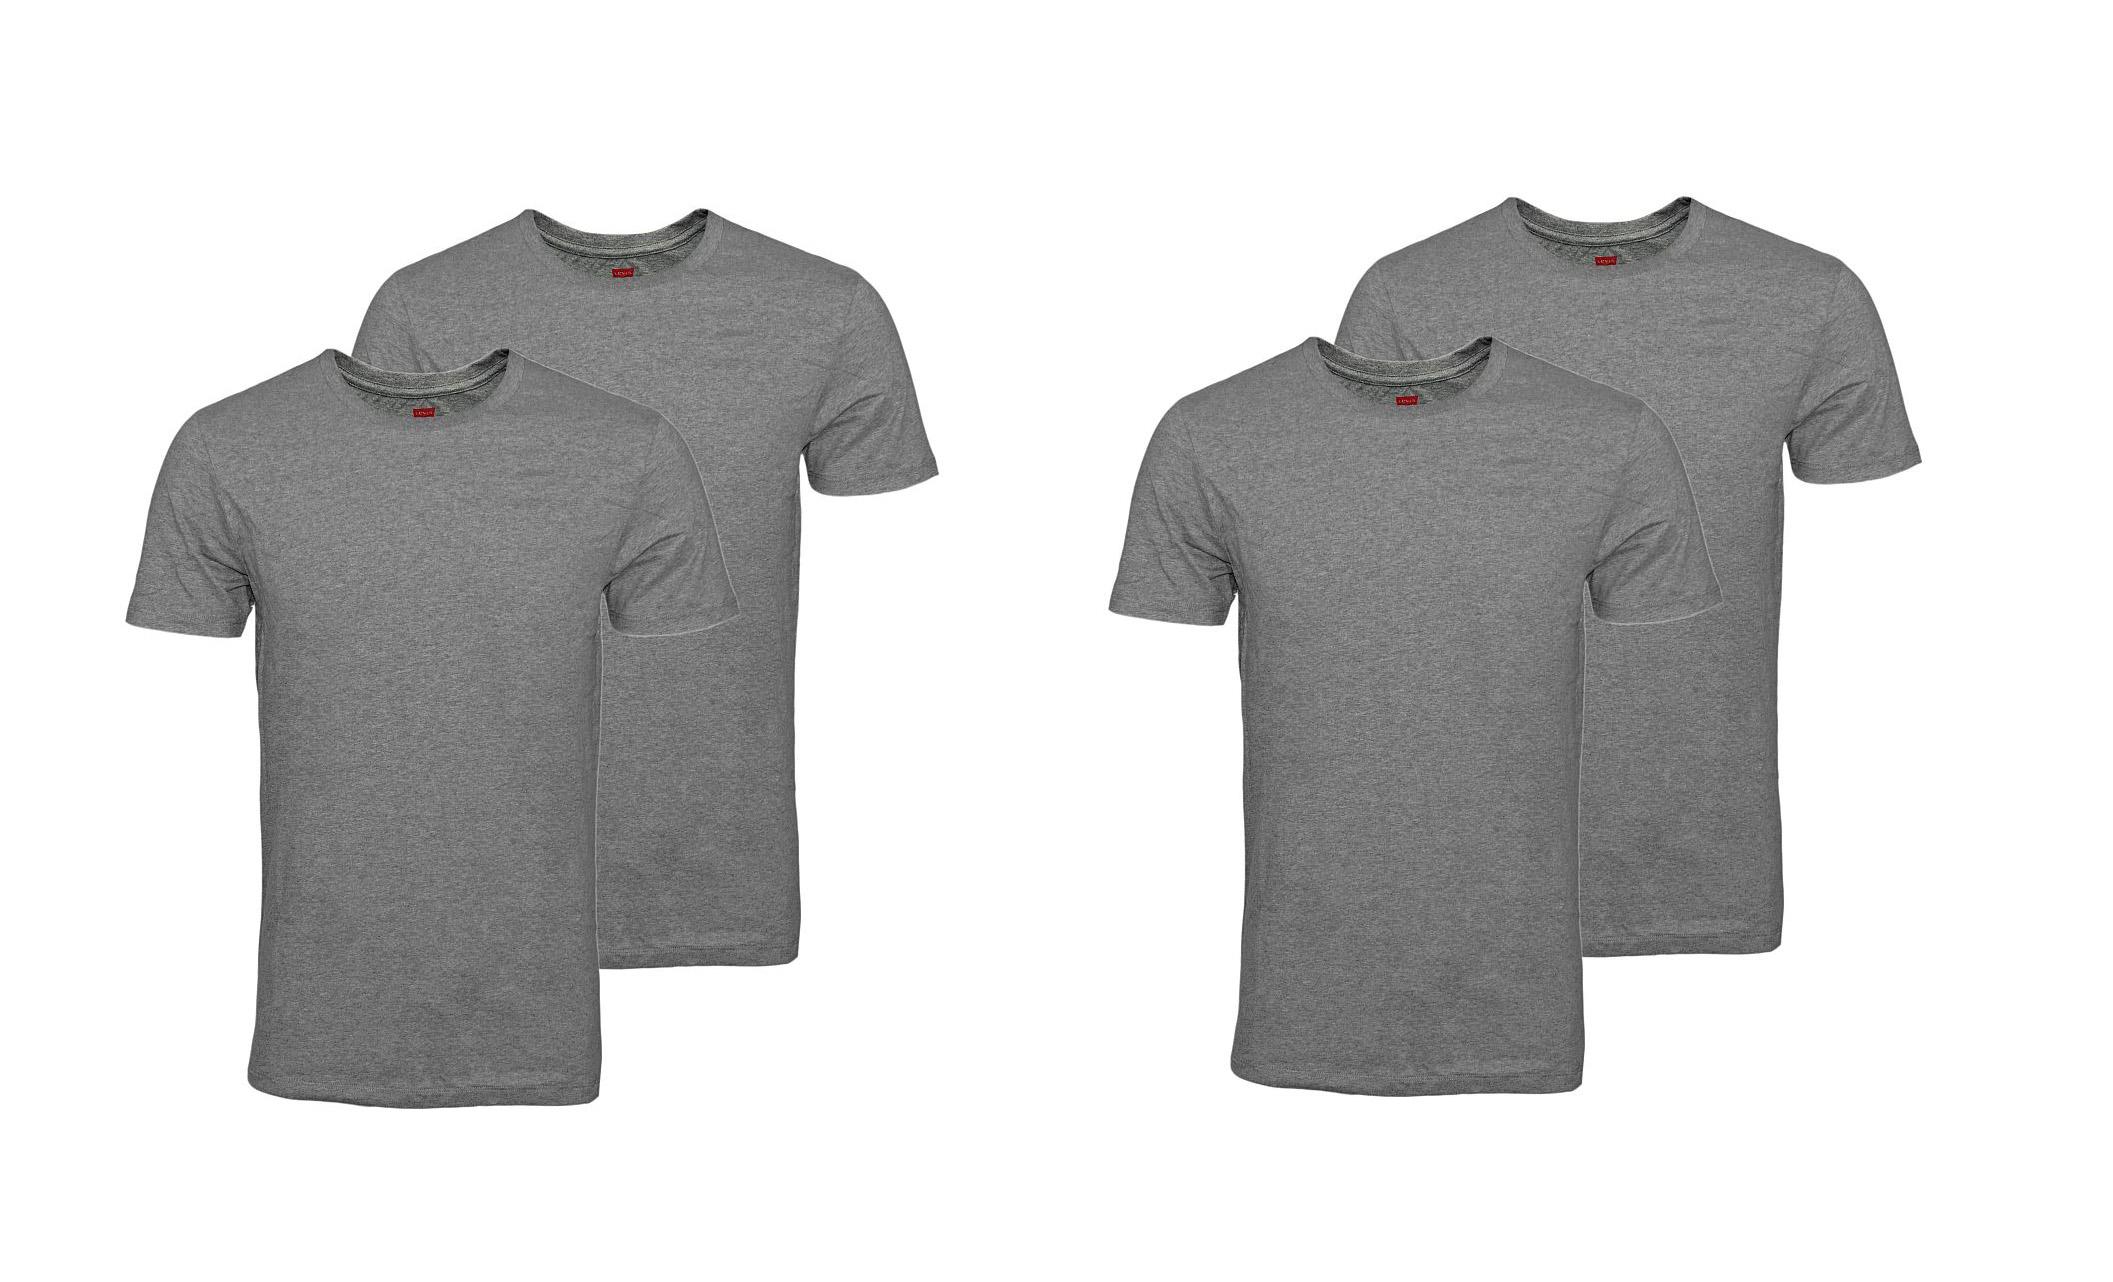 LEVIS Shirts 200SF 2 x 2er Pack T-Shirt Shirts Middle Grey Melange 945003001 758 SF17-LVSS2